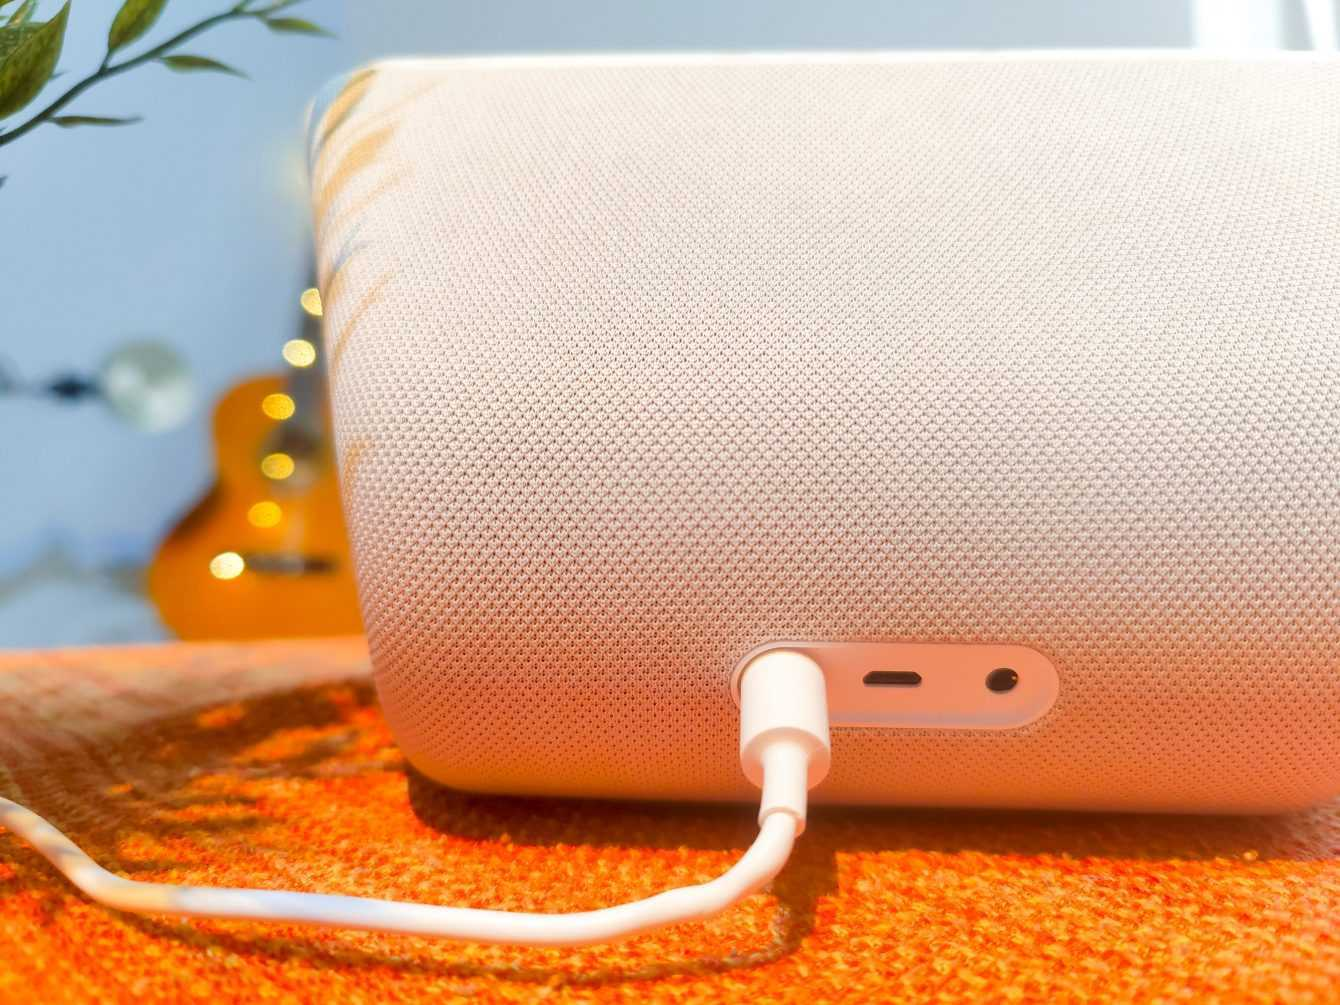 Recensione Amazon Echo Show 8: ecco il best buy!